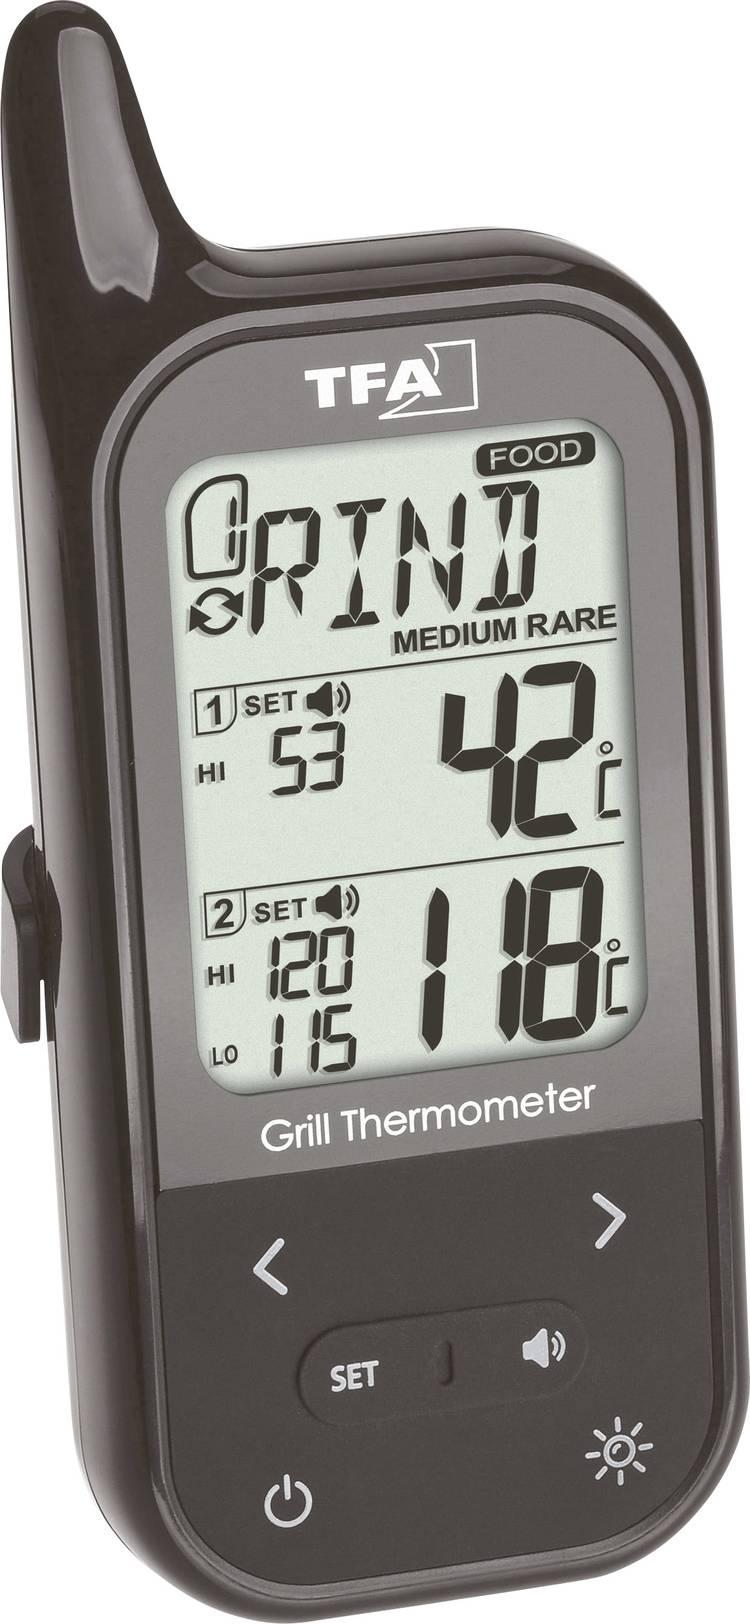 TFA 14.1511.01 Barbecuethermometer alarm. kabelsensor. oven- en kerntemperatuur